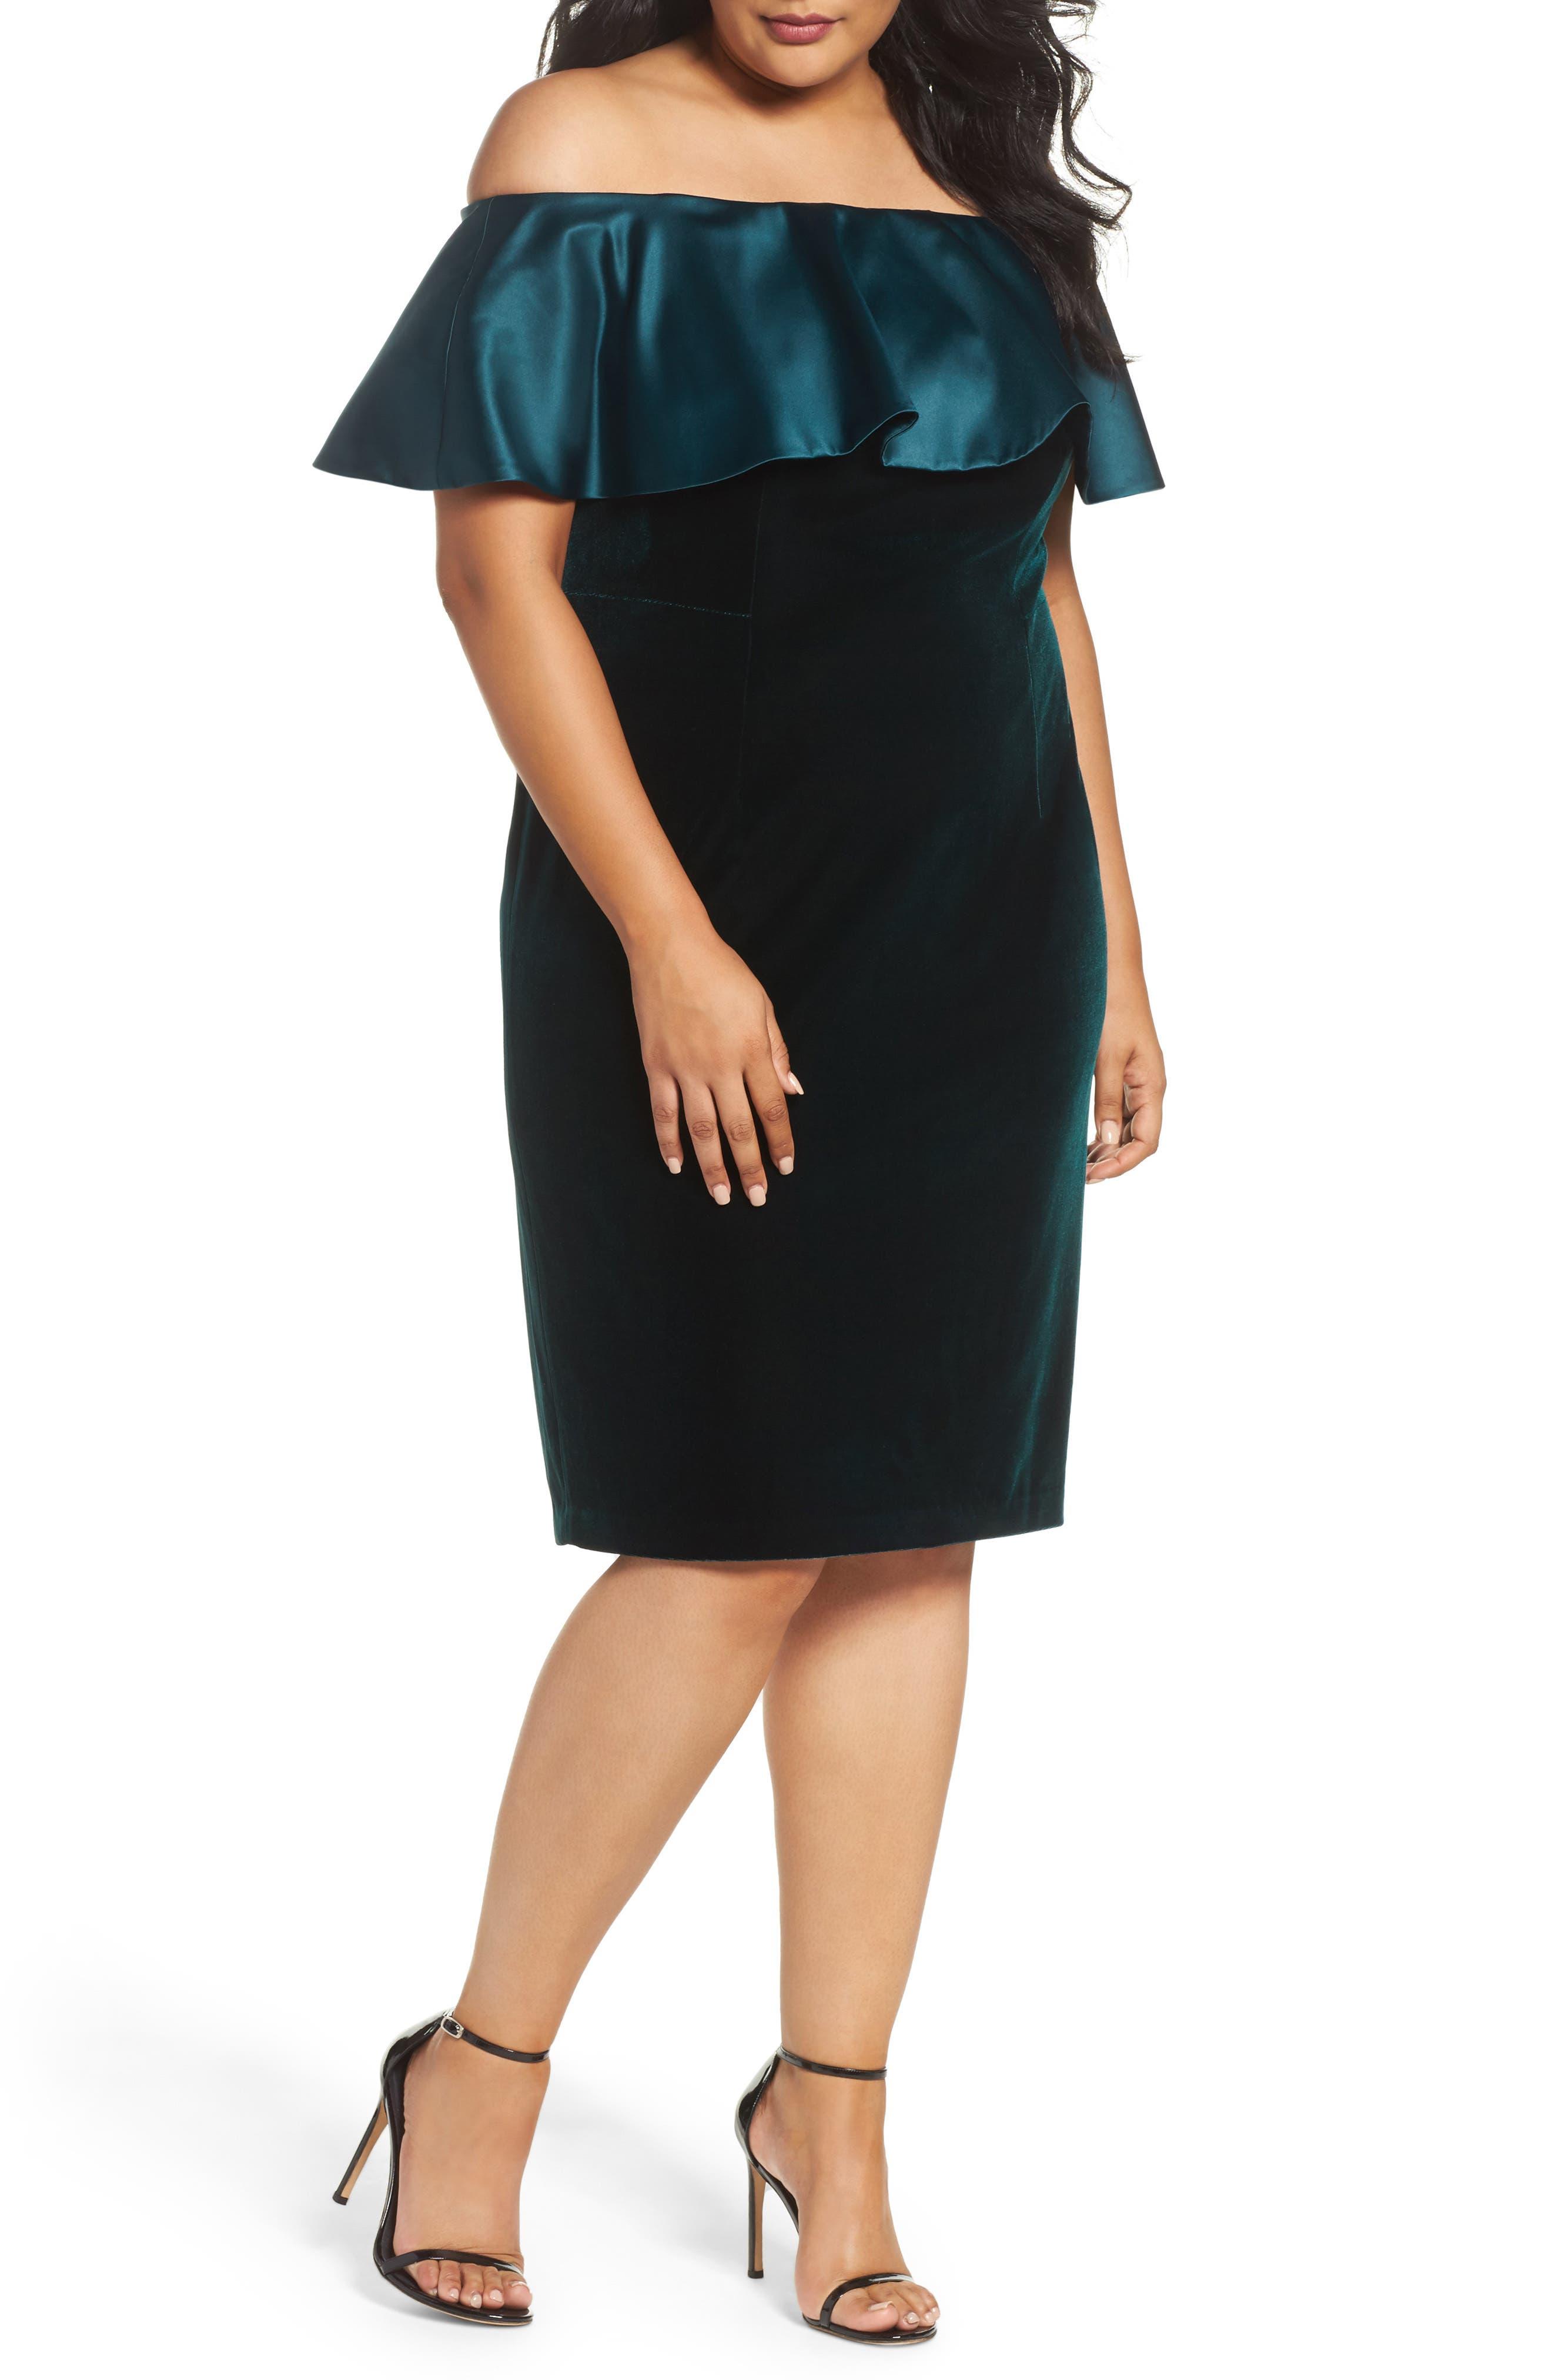 Adriana Papell Stretch Velvet Sheath Dress,                             Main thumbnail 1, color,                             321